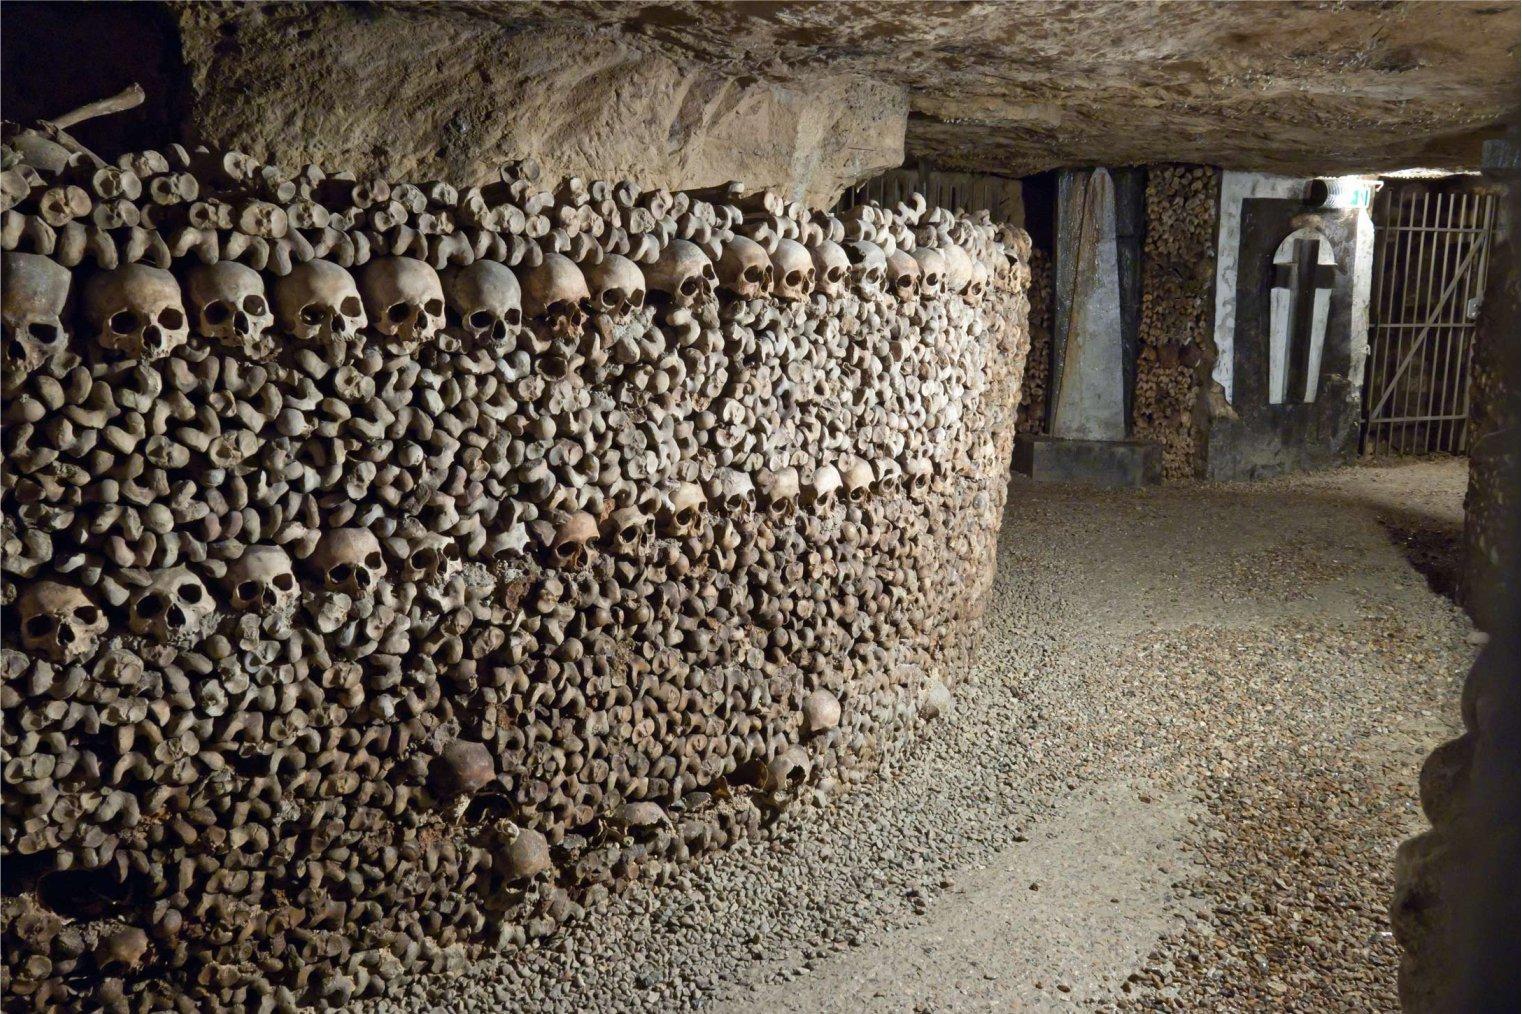 Catacombs of Paris. Travel. Катакомбы Парижа. Туризм